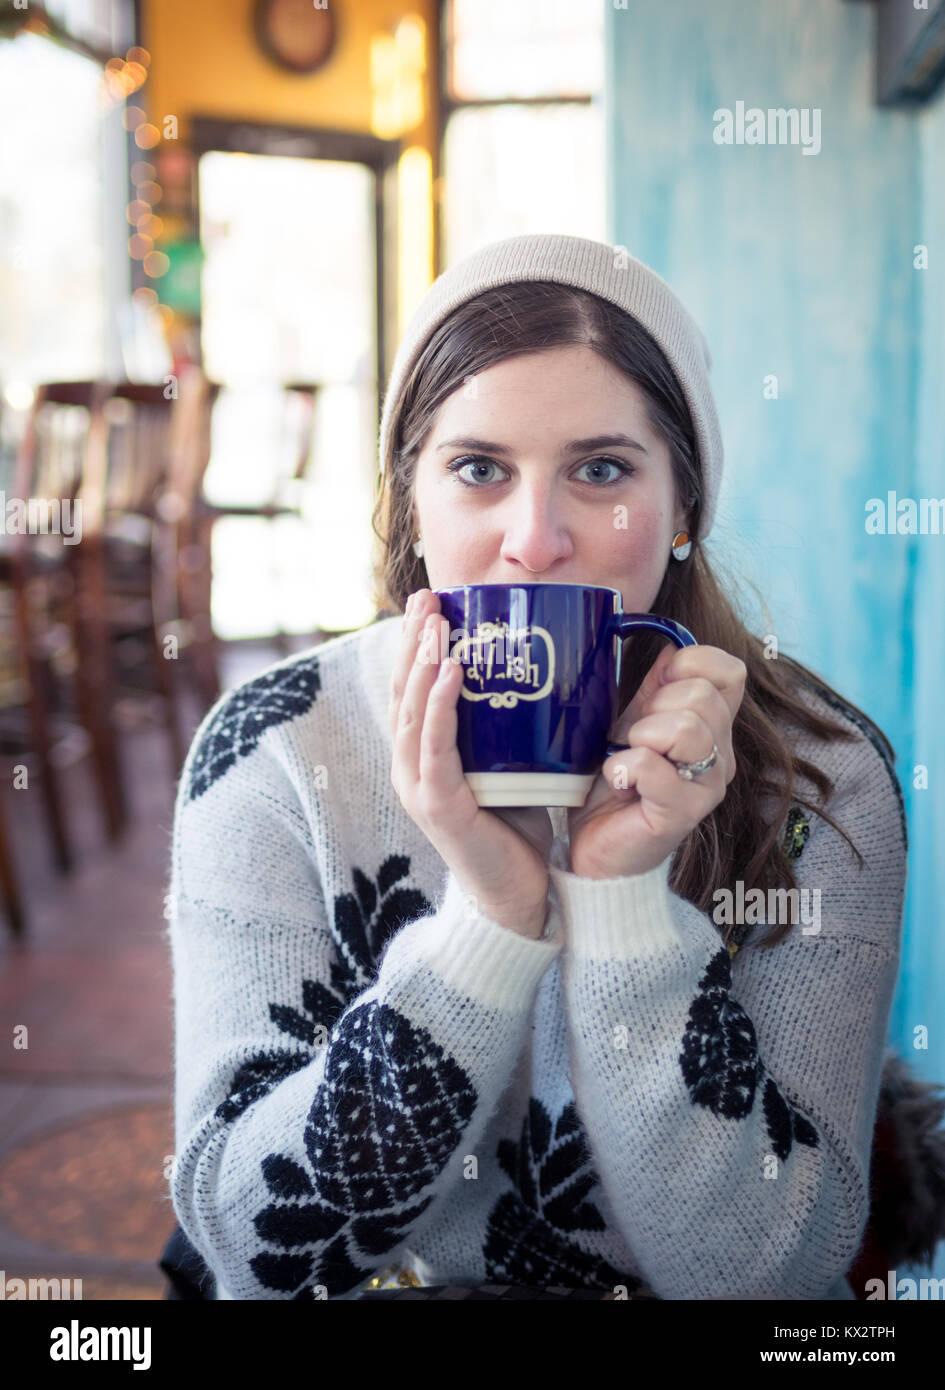 A pretty brunette girl sips a caffè latte from d'Lish by Tish Cafe in Saskatoon, Saskatchewan, Canada. - Stock Image